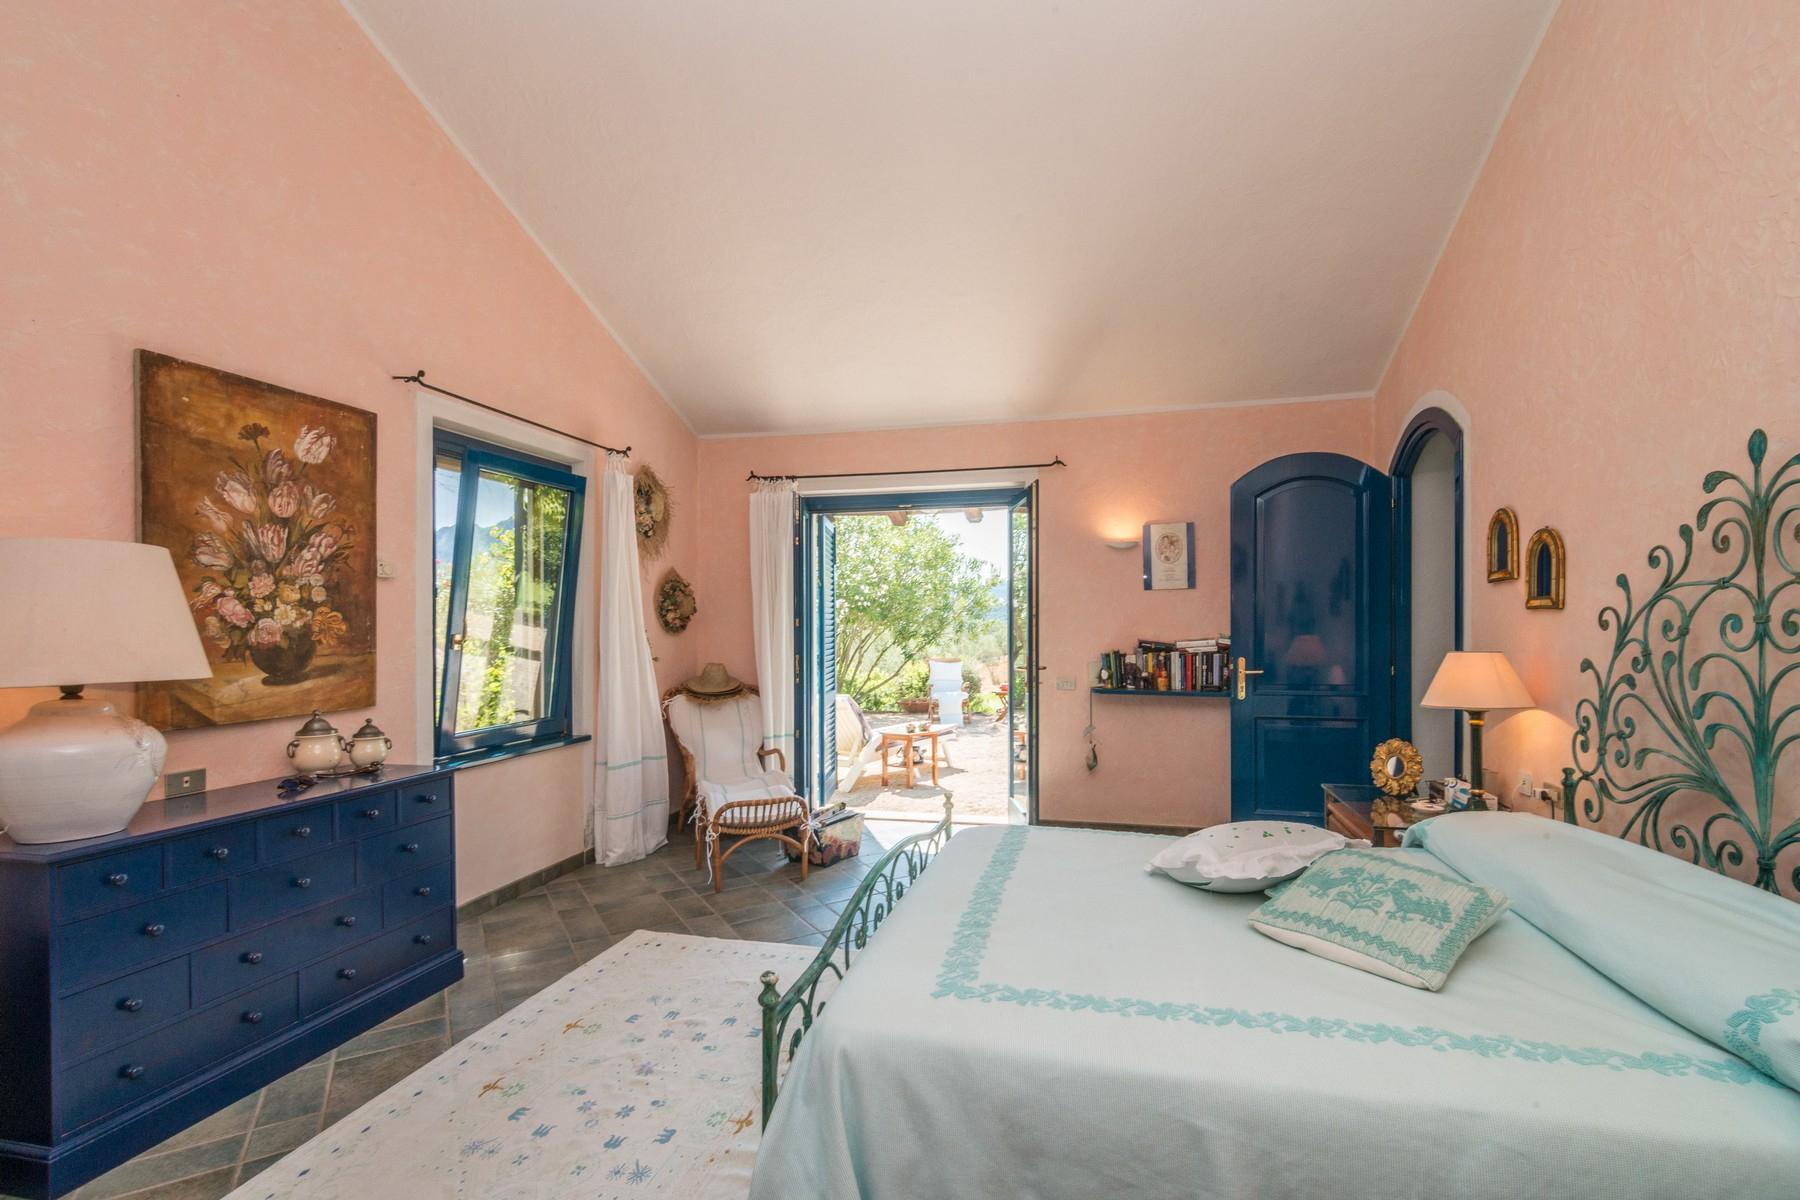 Casa indipendente in Vendita a Olbia: 5 locali, 230 mq - Foto 19